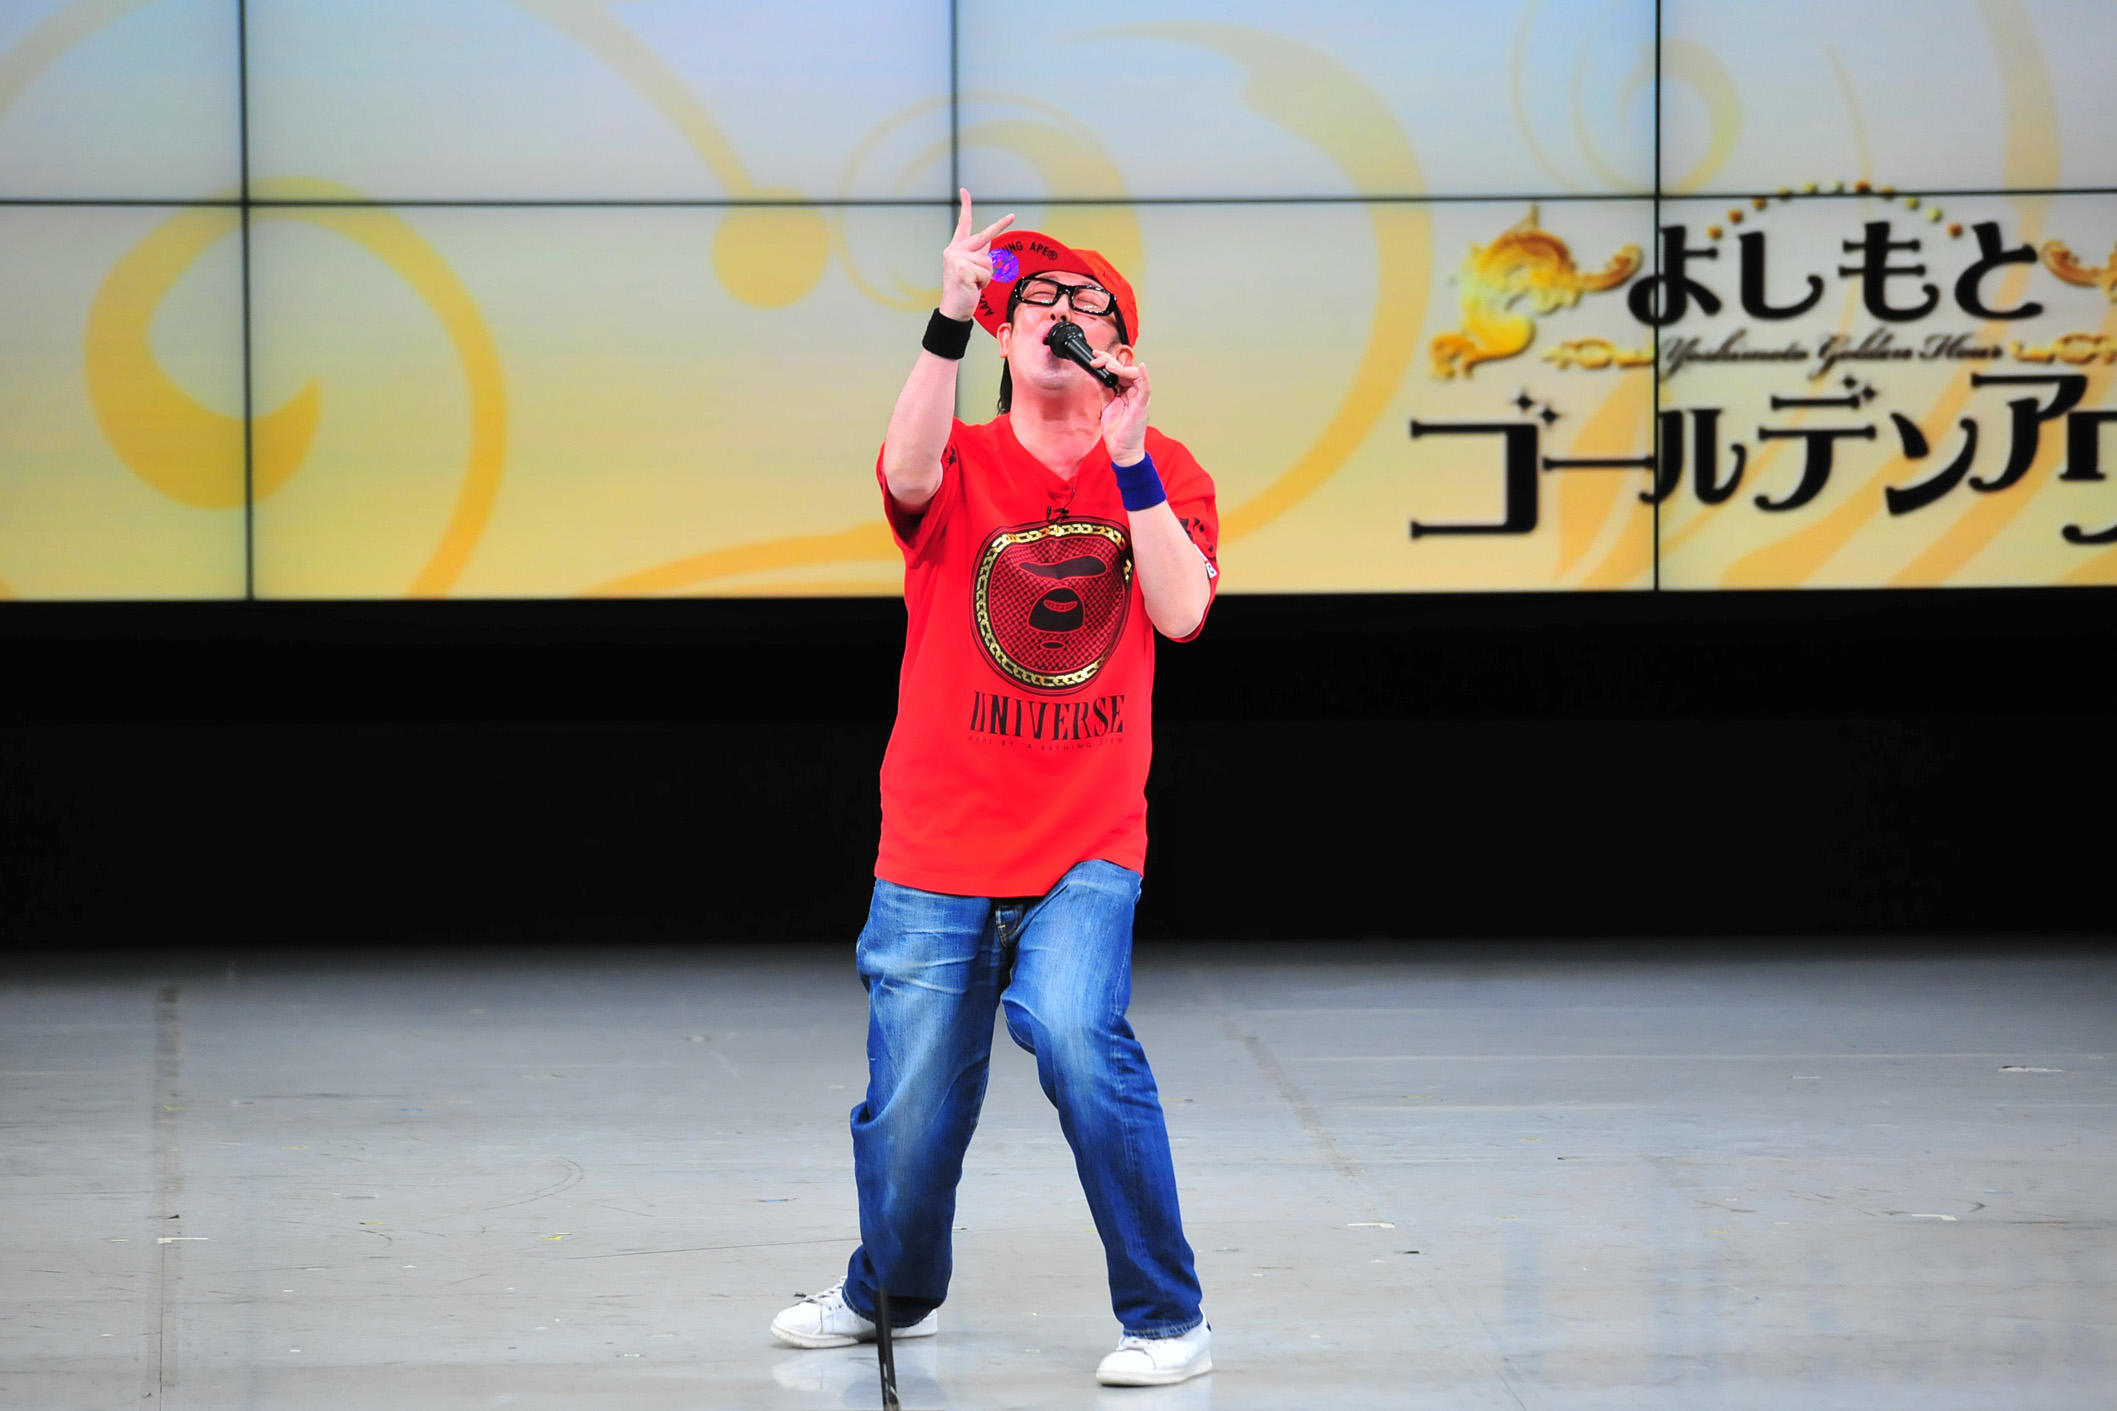 http://news.yoshimoto.co.jp/20160429204323-fdf8a471e9befa7fd75cafb1cb44eaa2fcd41bc0.jpg